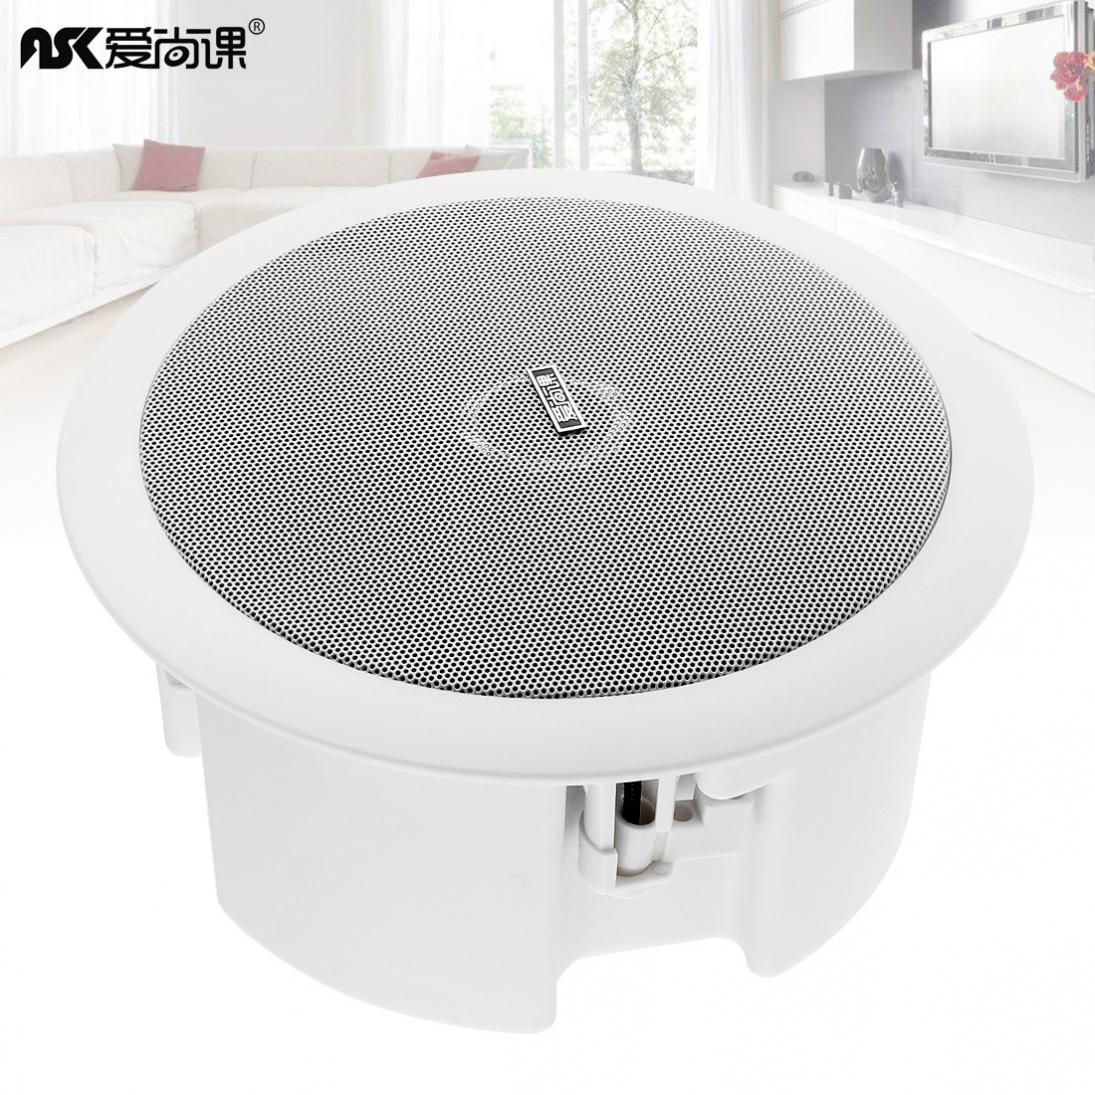 KS-812B 6 Inch 10W Fashion Round High Sensitivity Coaxial Radio Ceiling Speaker Public Broadcast  Background Music Speaker